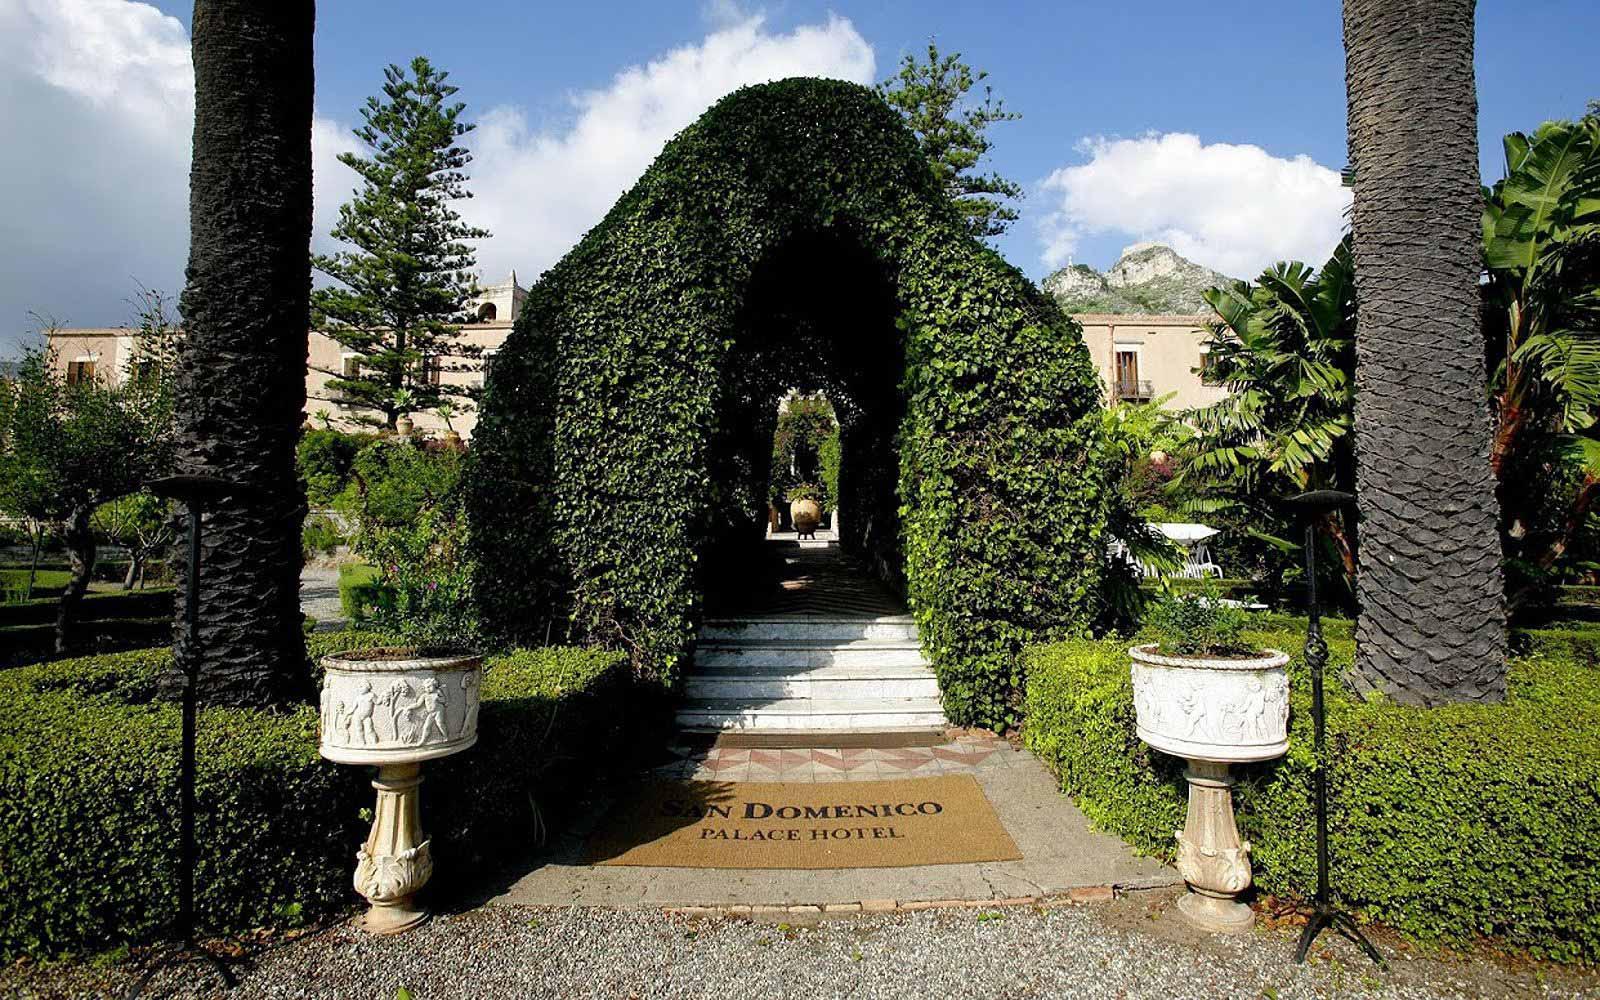 Gardens at San Domenico Palace Hotel